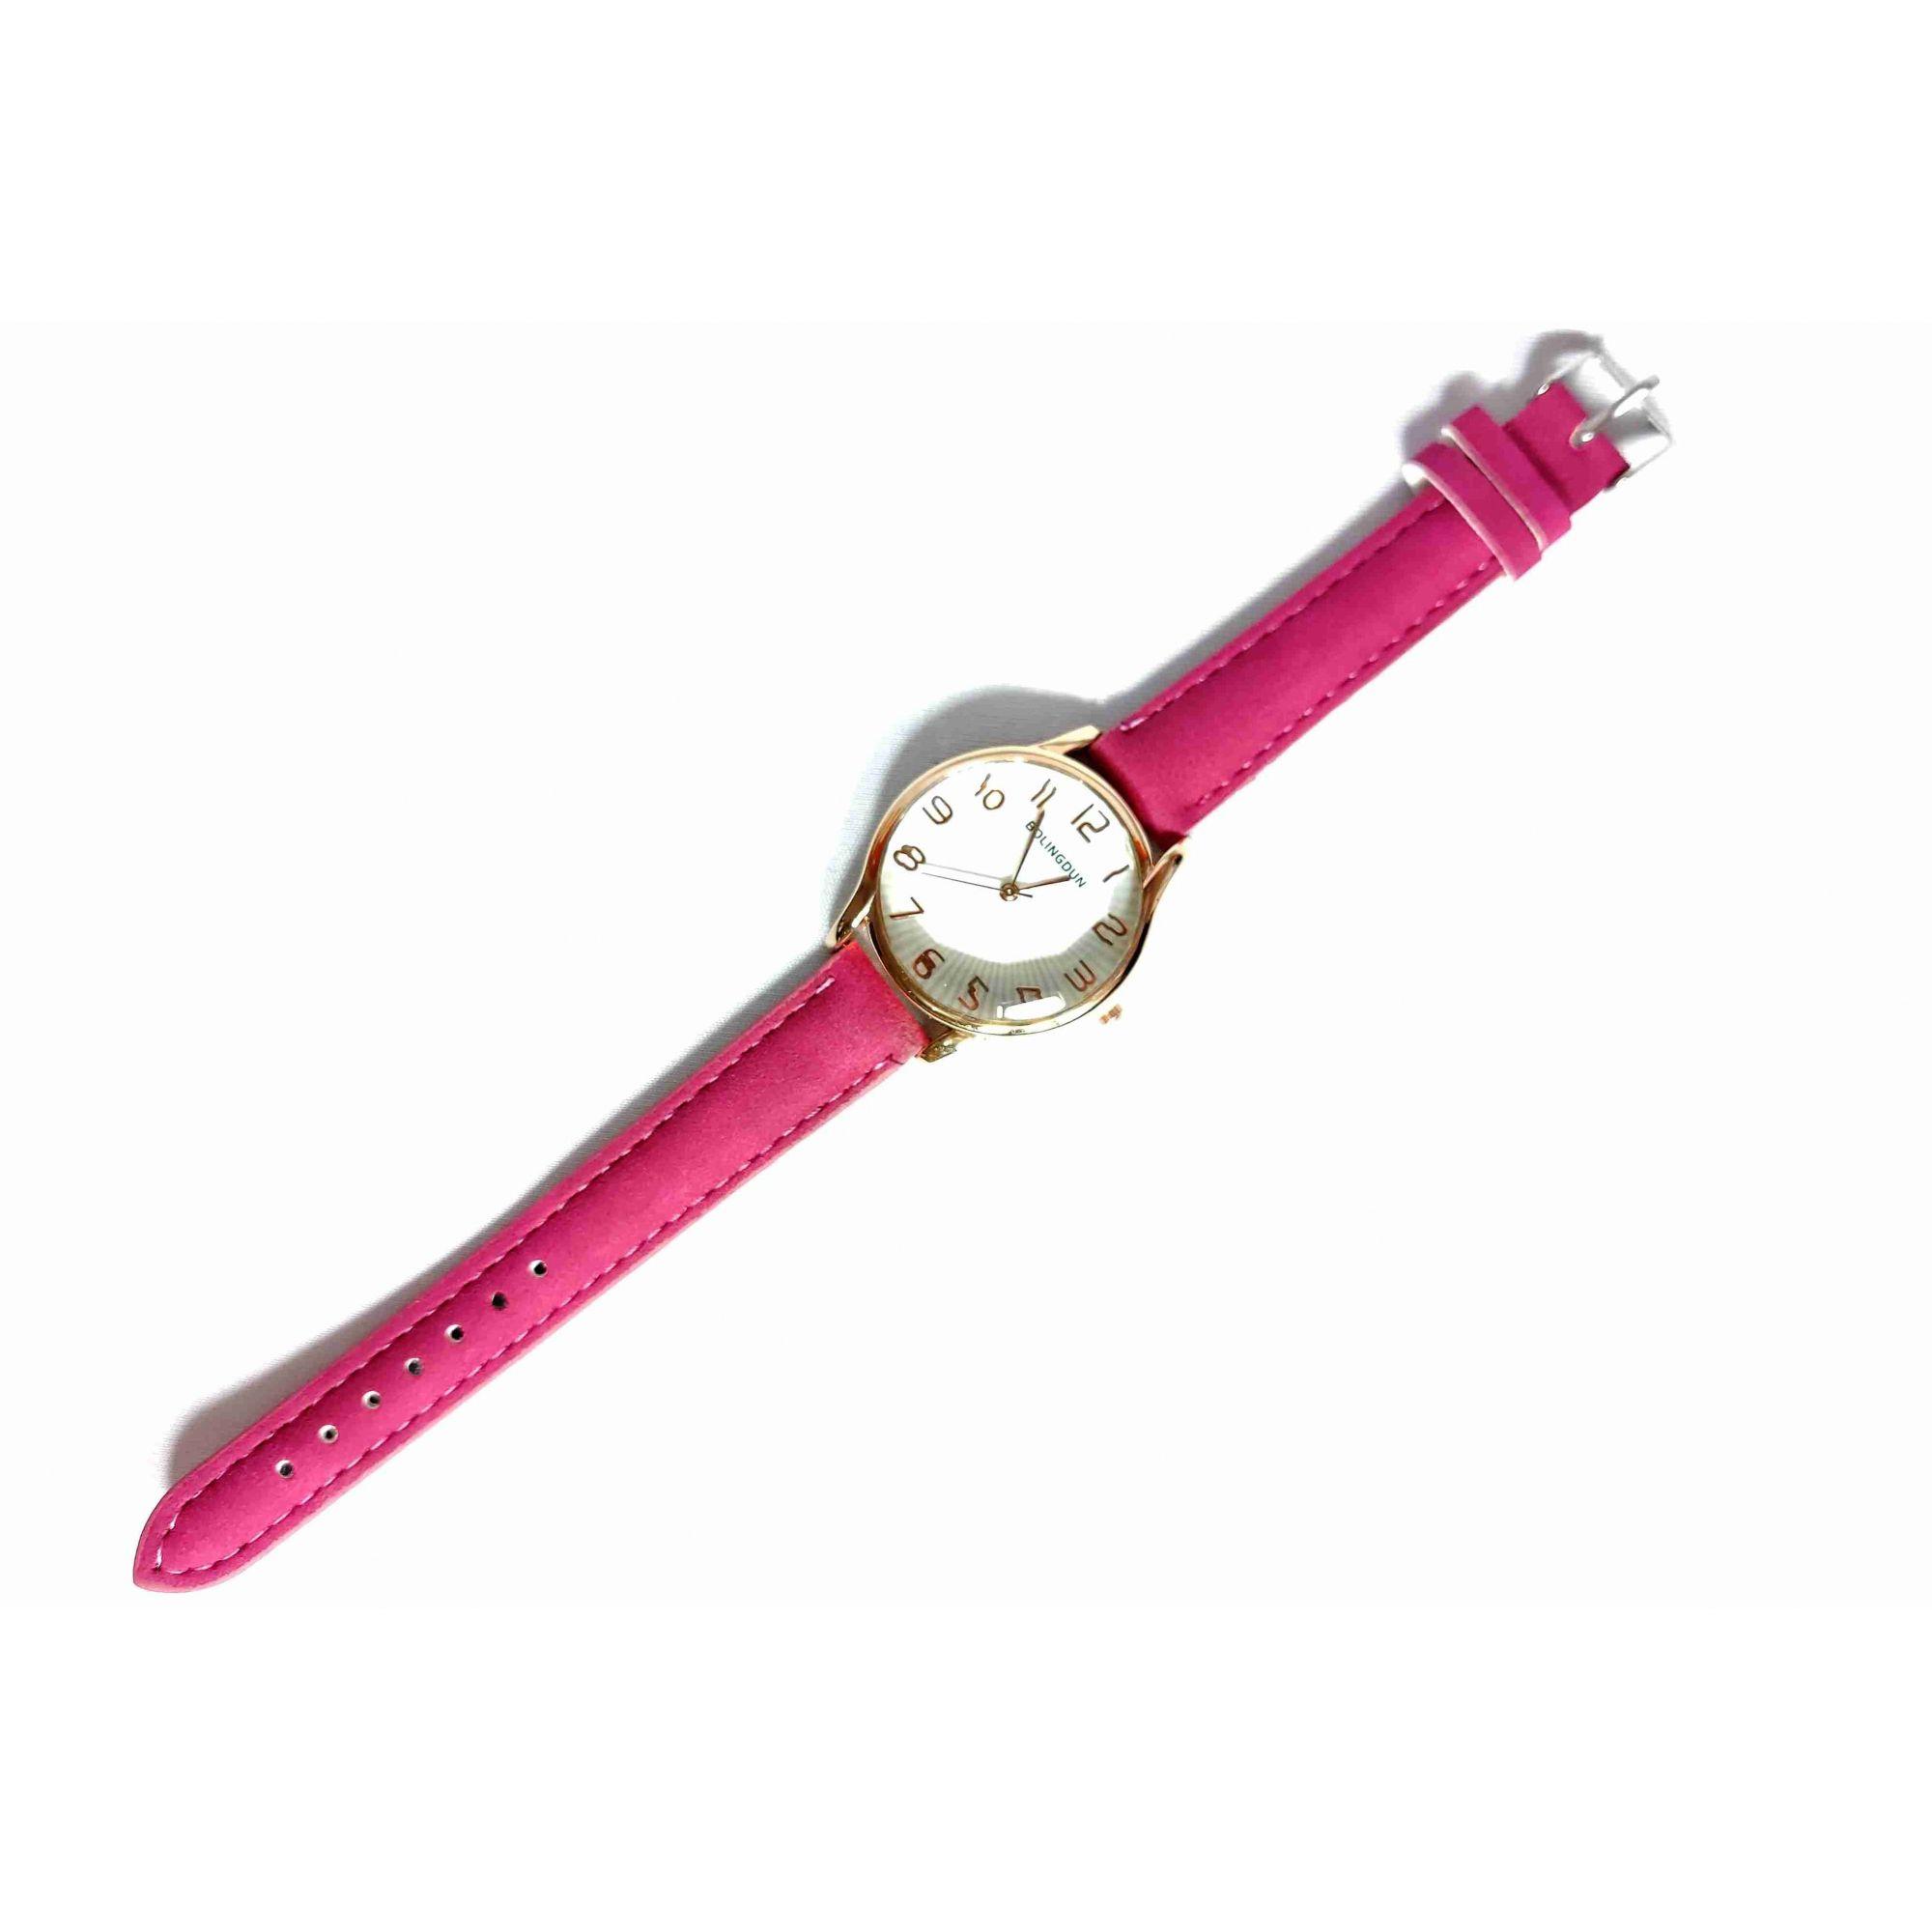 Relógio Feminino Quartz Pulseira Couro Rosa